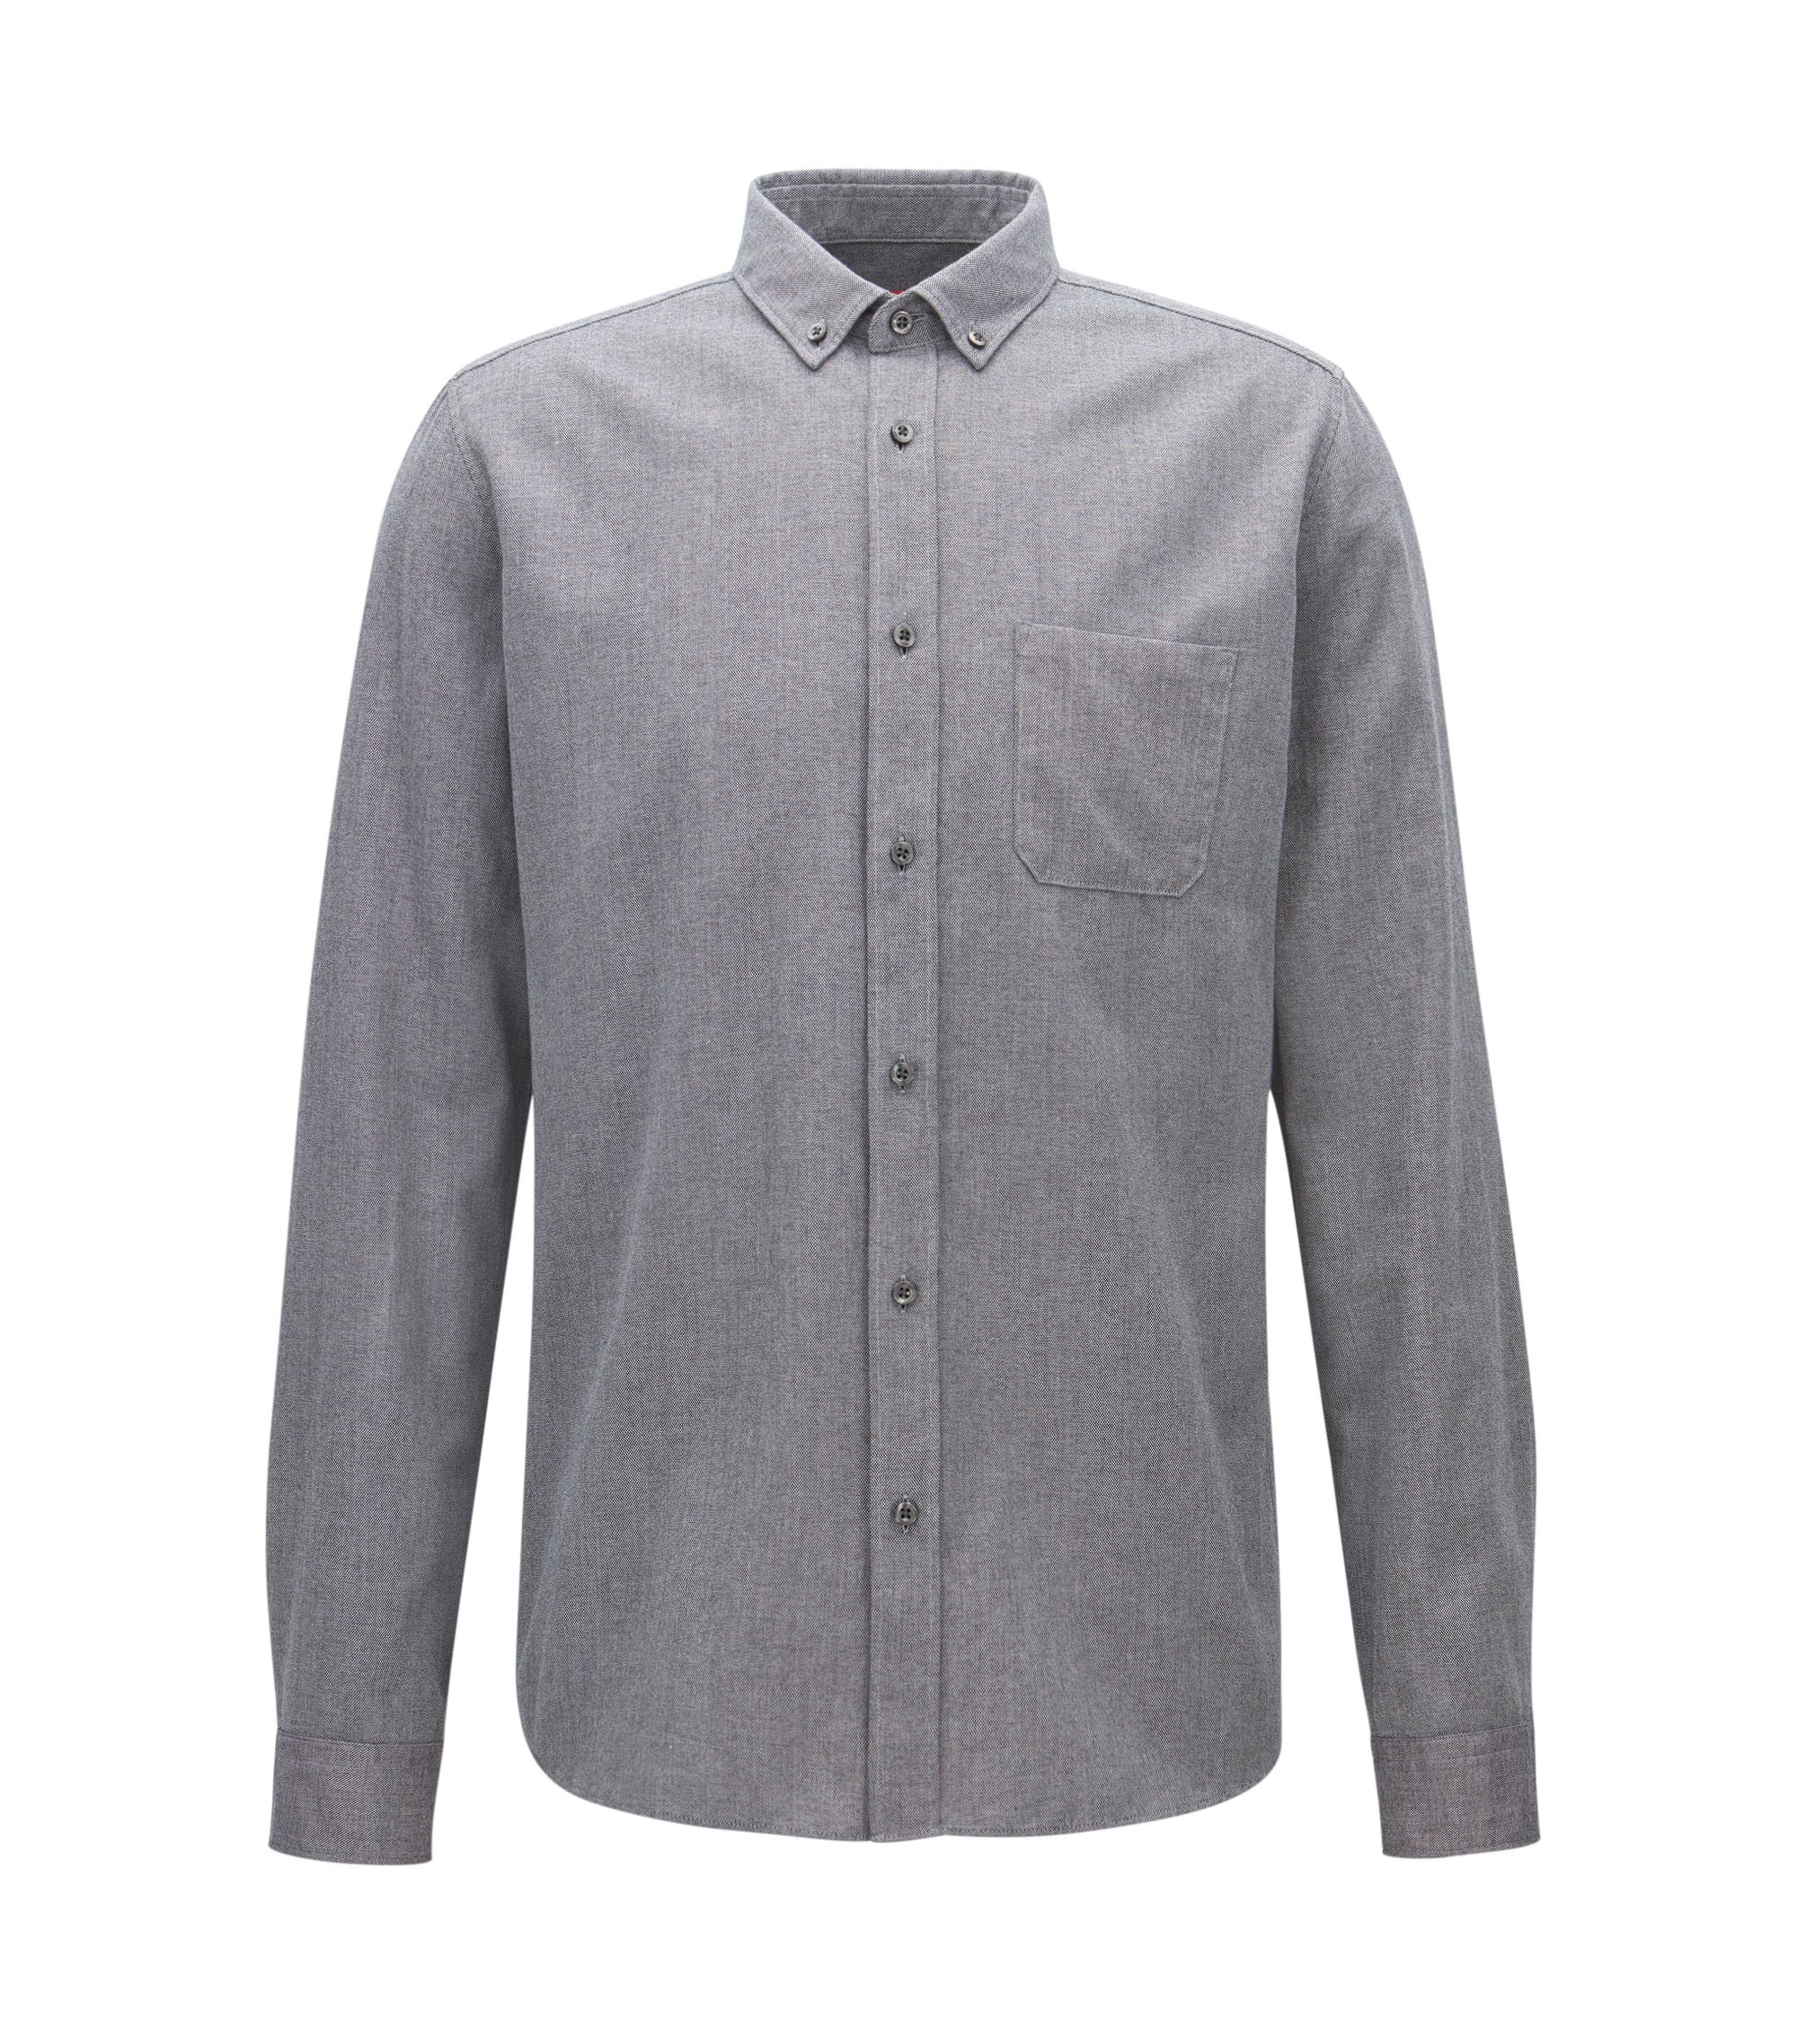 Relaxed-fit mouliné-overhemd van middelzware corduroy, Antraciet